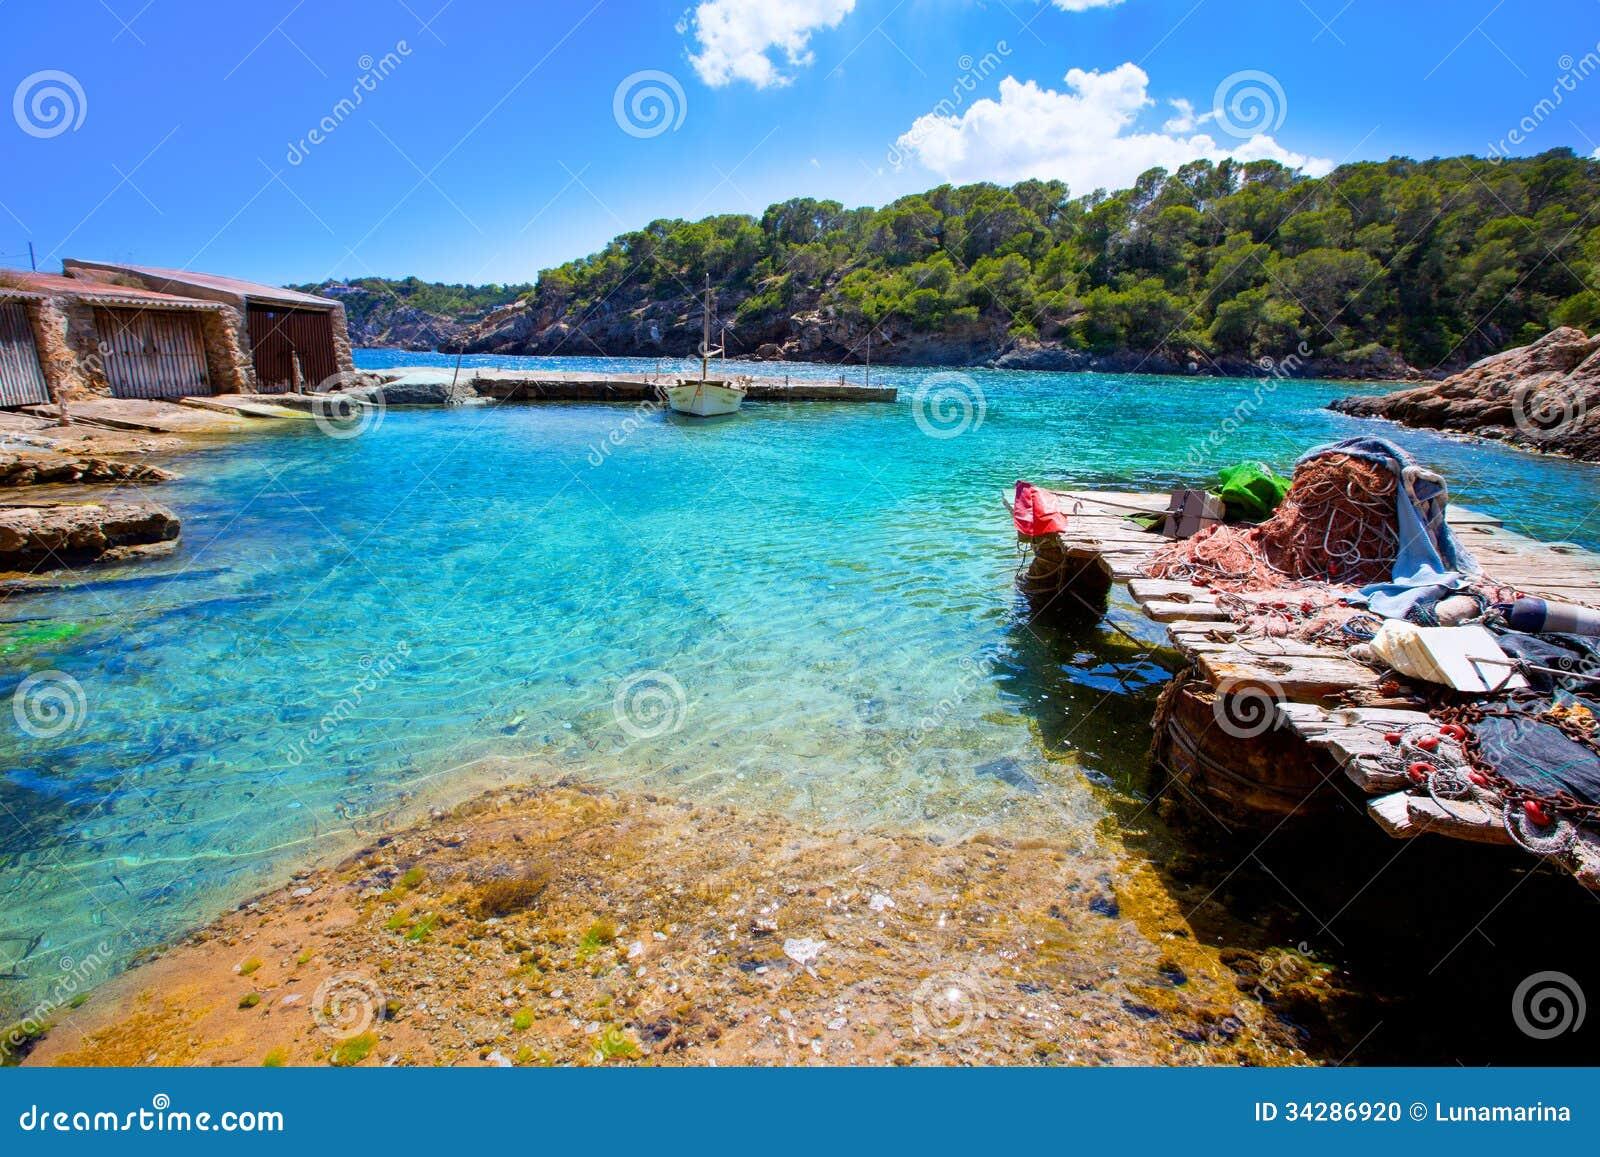 Ibiza cala mestella mastella in santa eularia des riu stock photo image of cape landscape - Santa eularia des riu ...